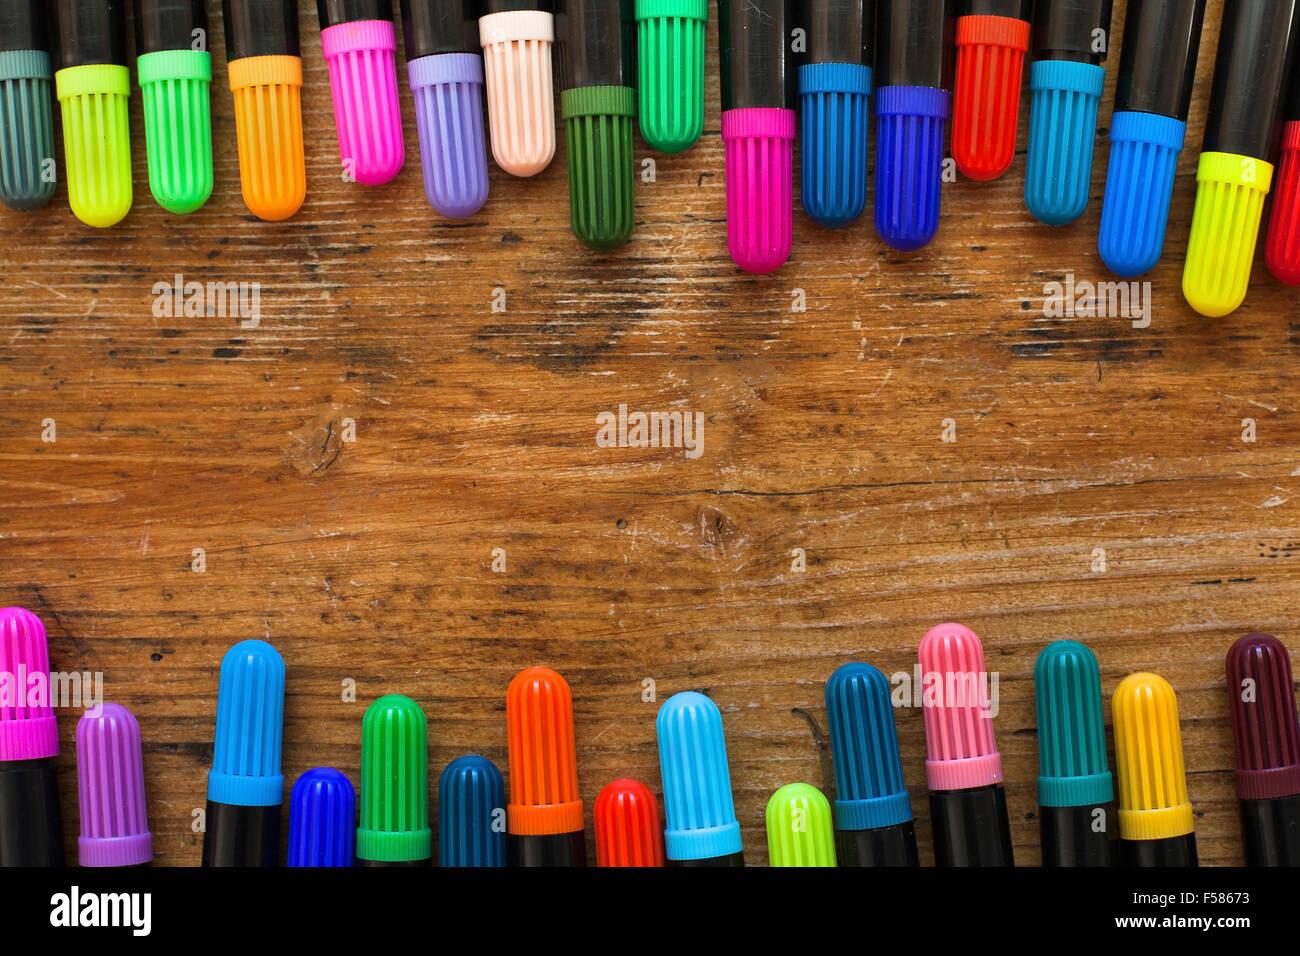 Marcadores de colores sobre un mostrador de madera, fondo Imagen De Stock